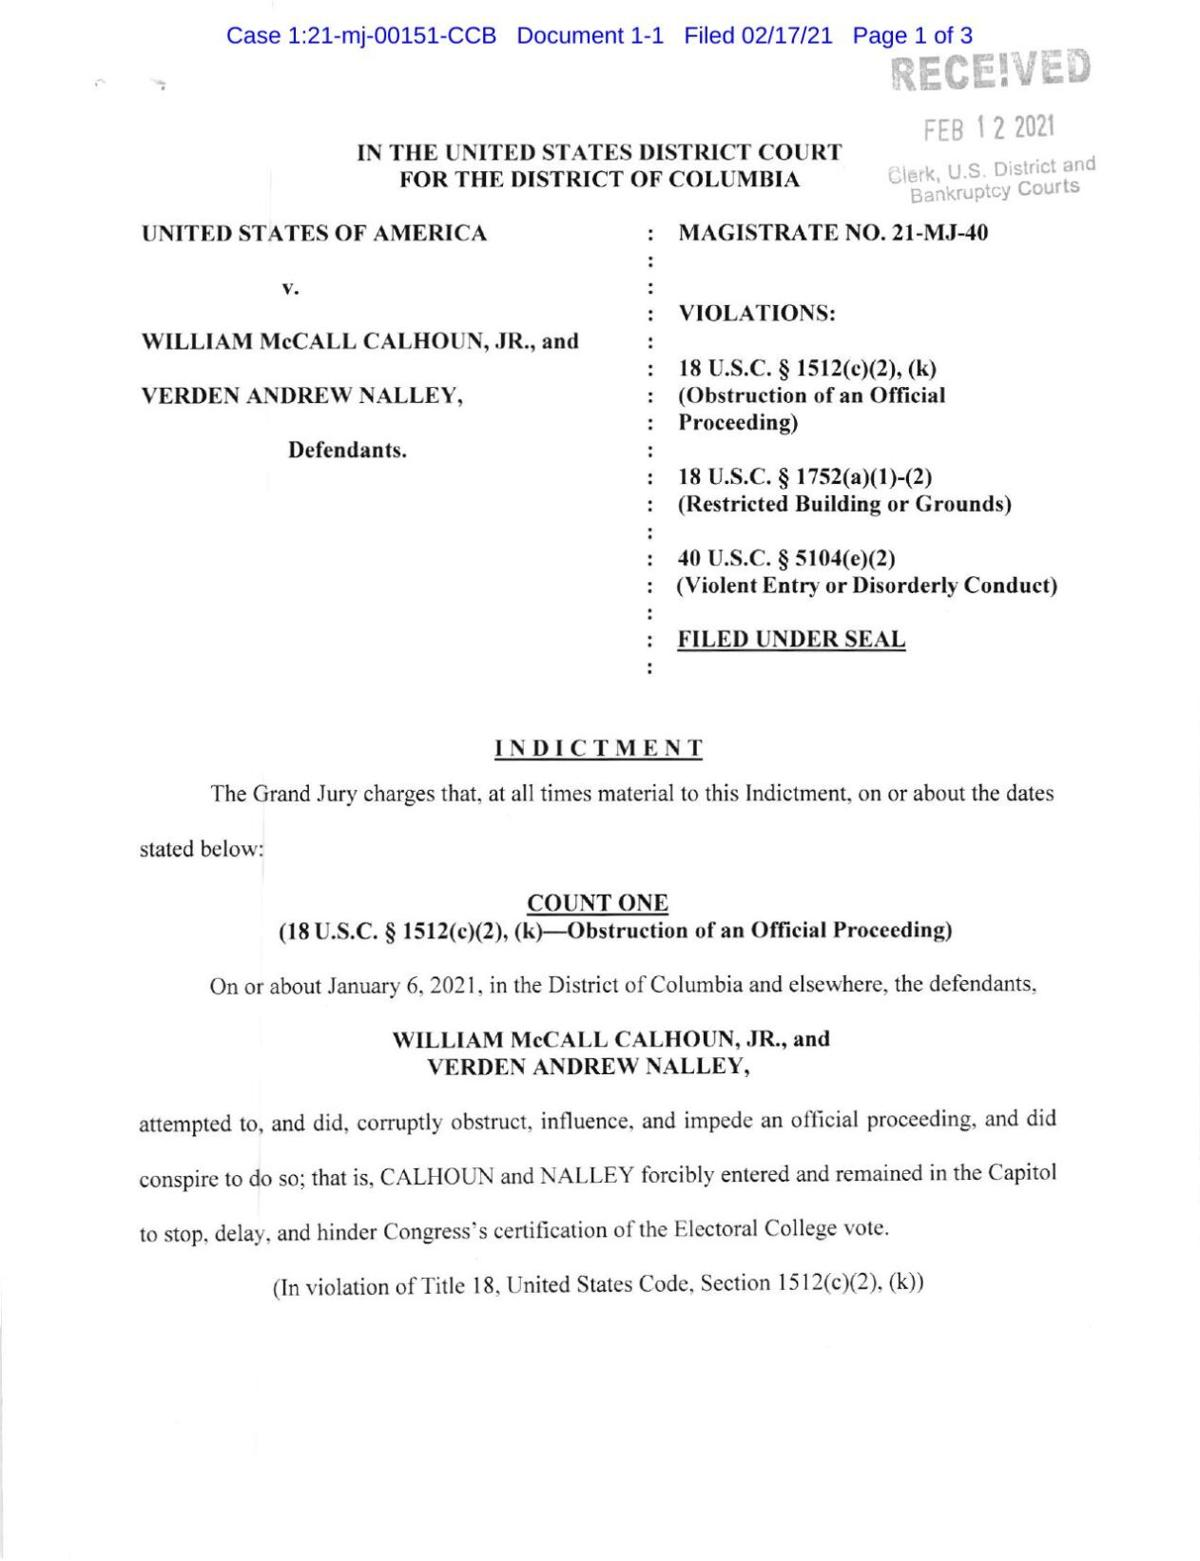 Verden Nalley and William Calhoun federal indictment